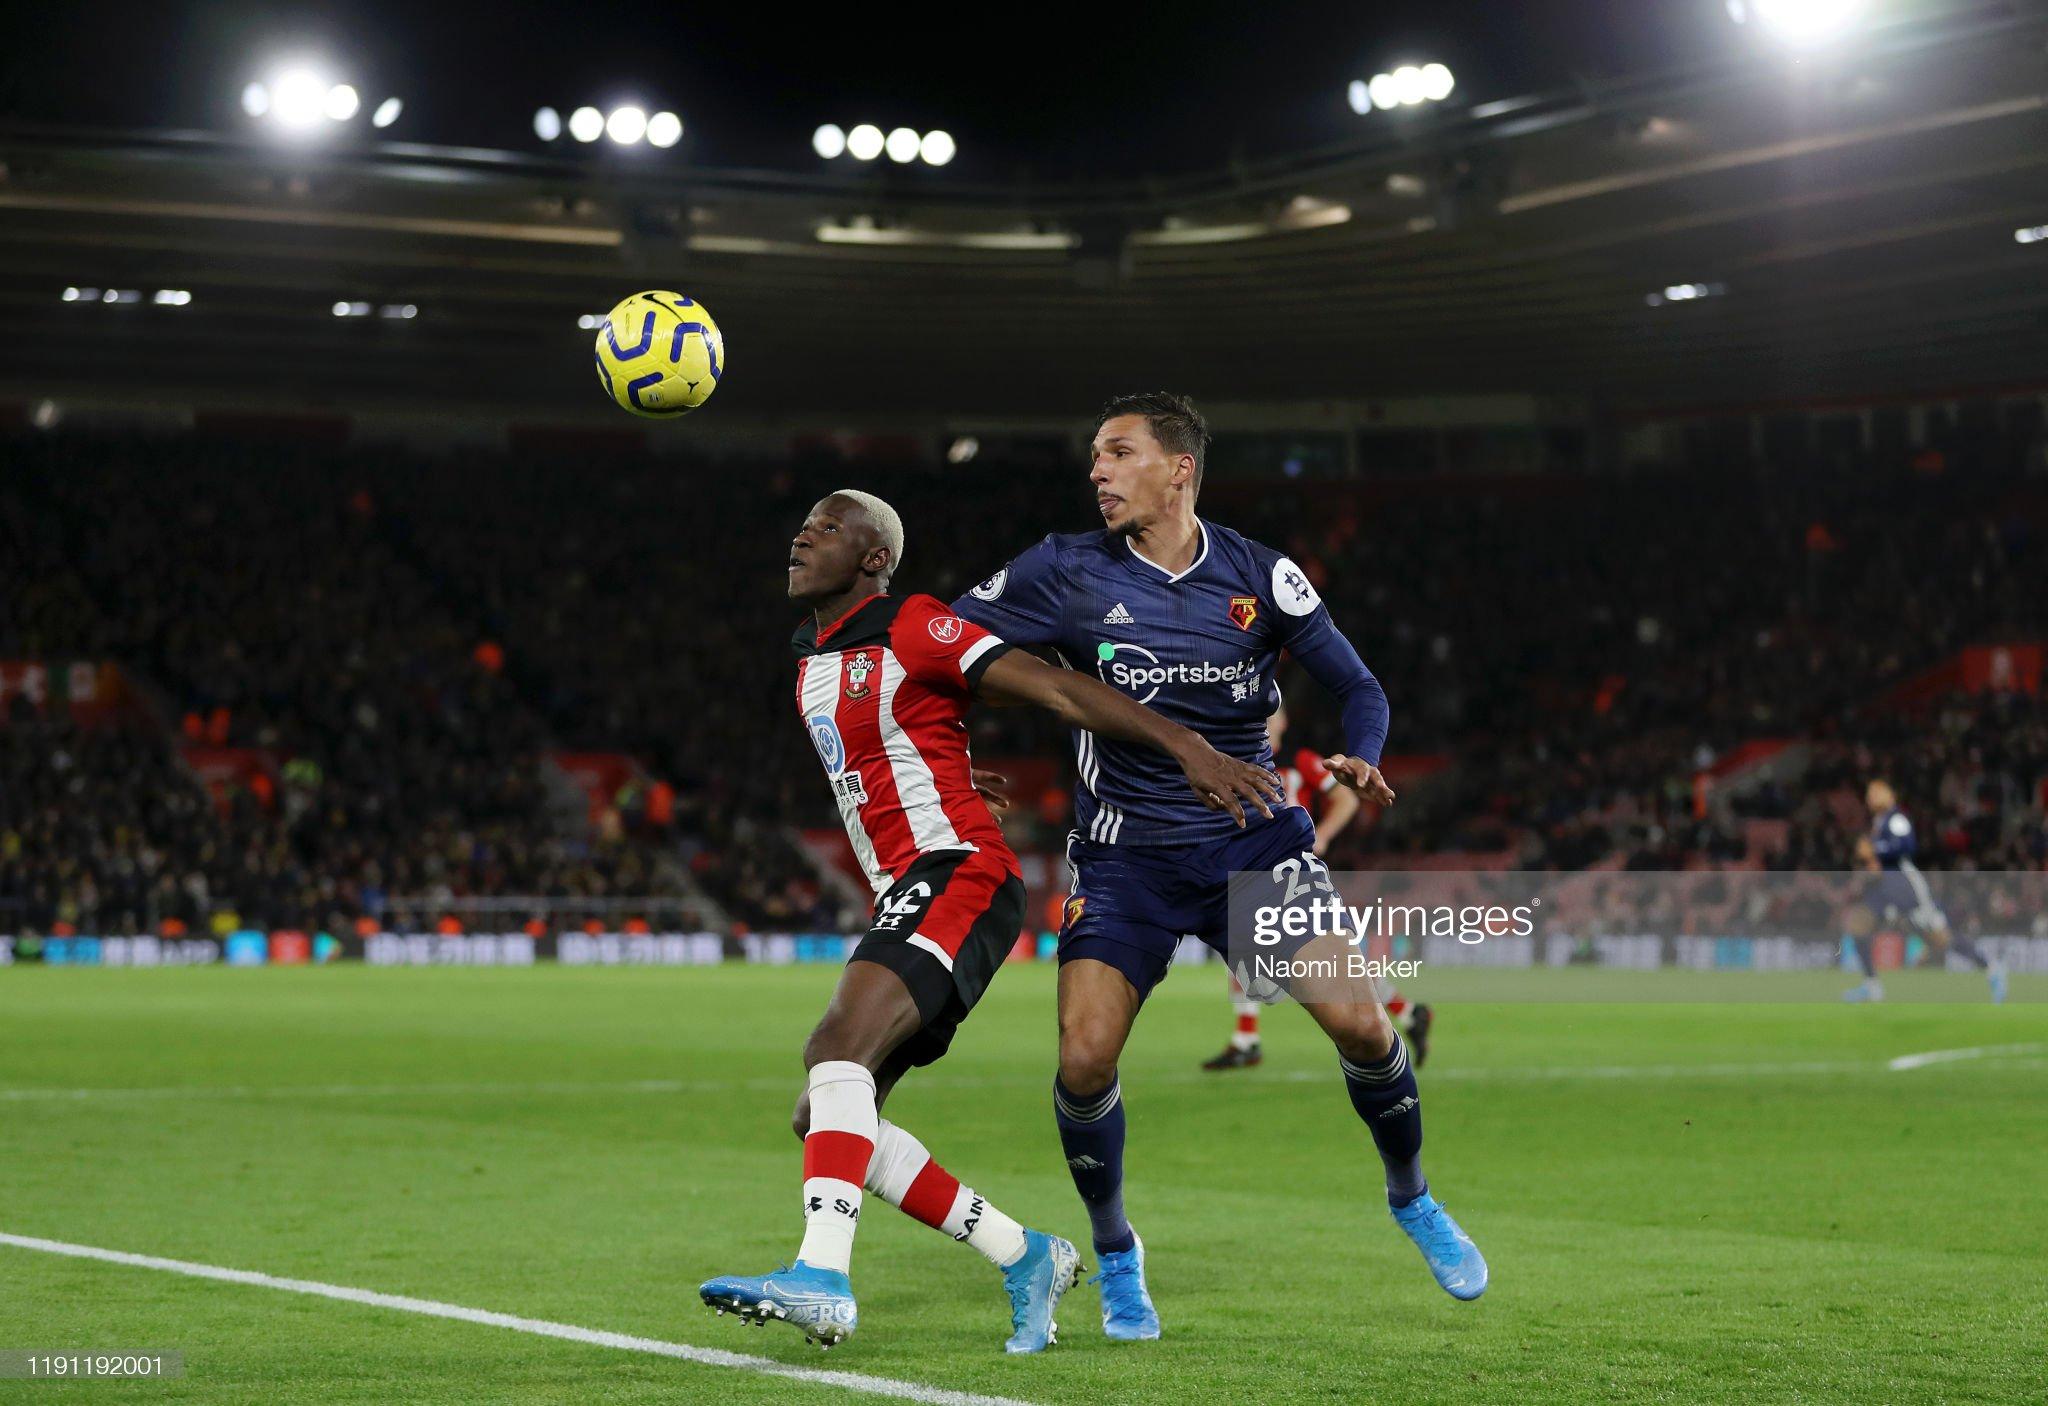 Watford vs Southampton Preview, prediction and odds